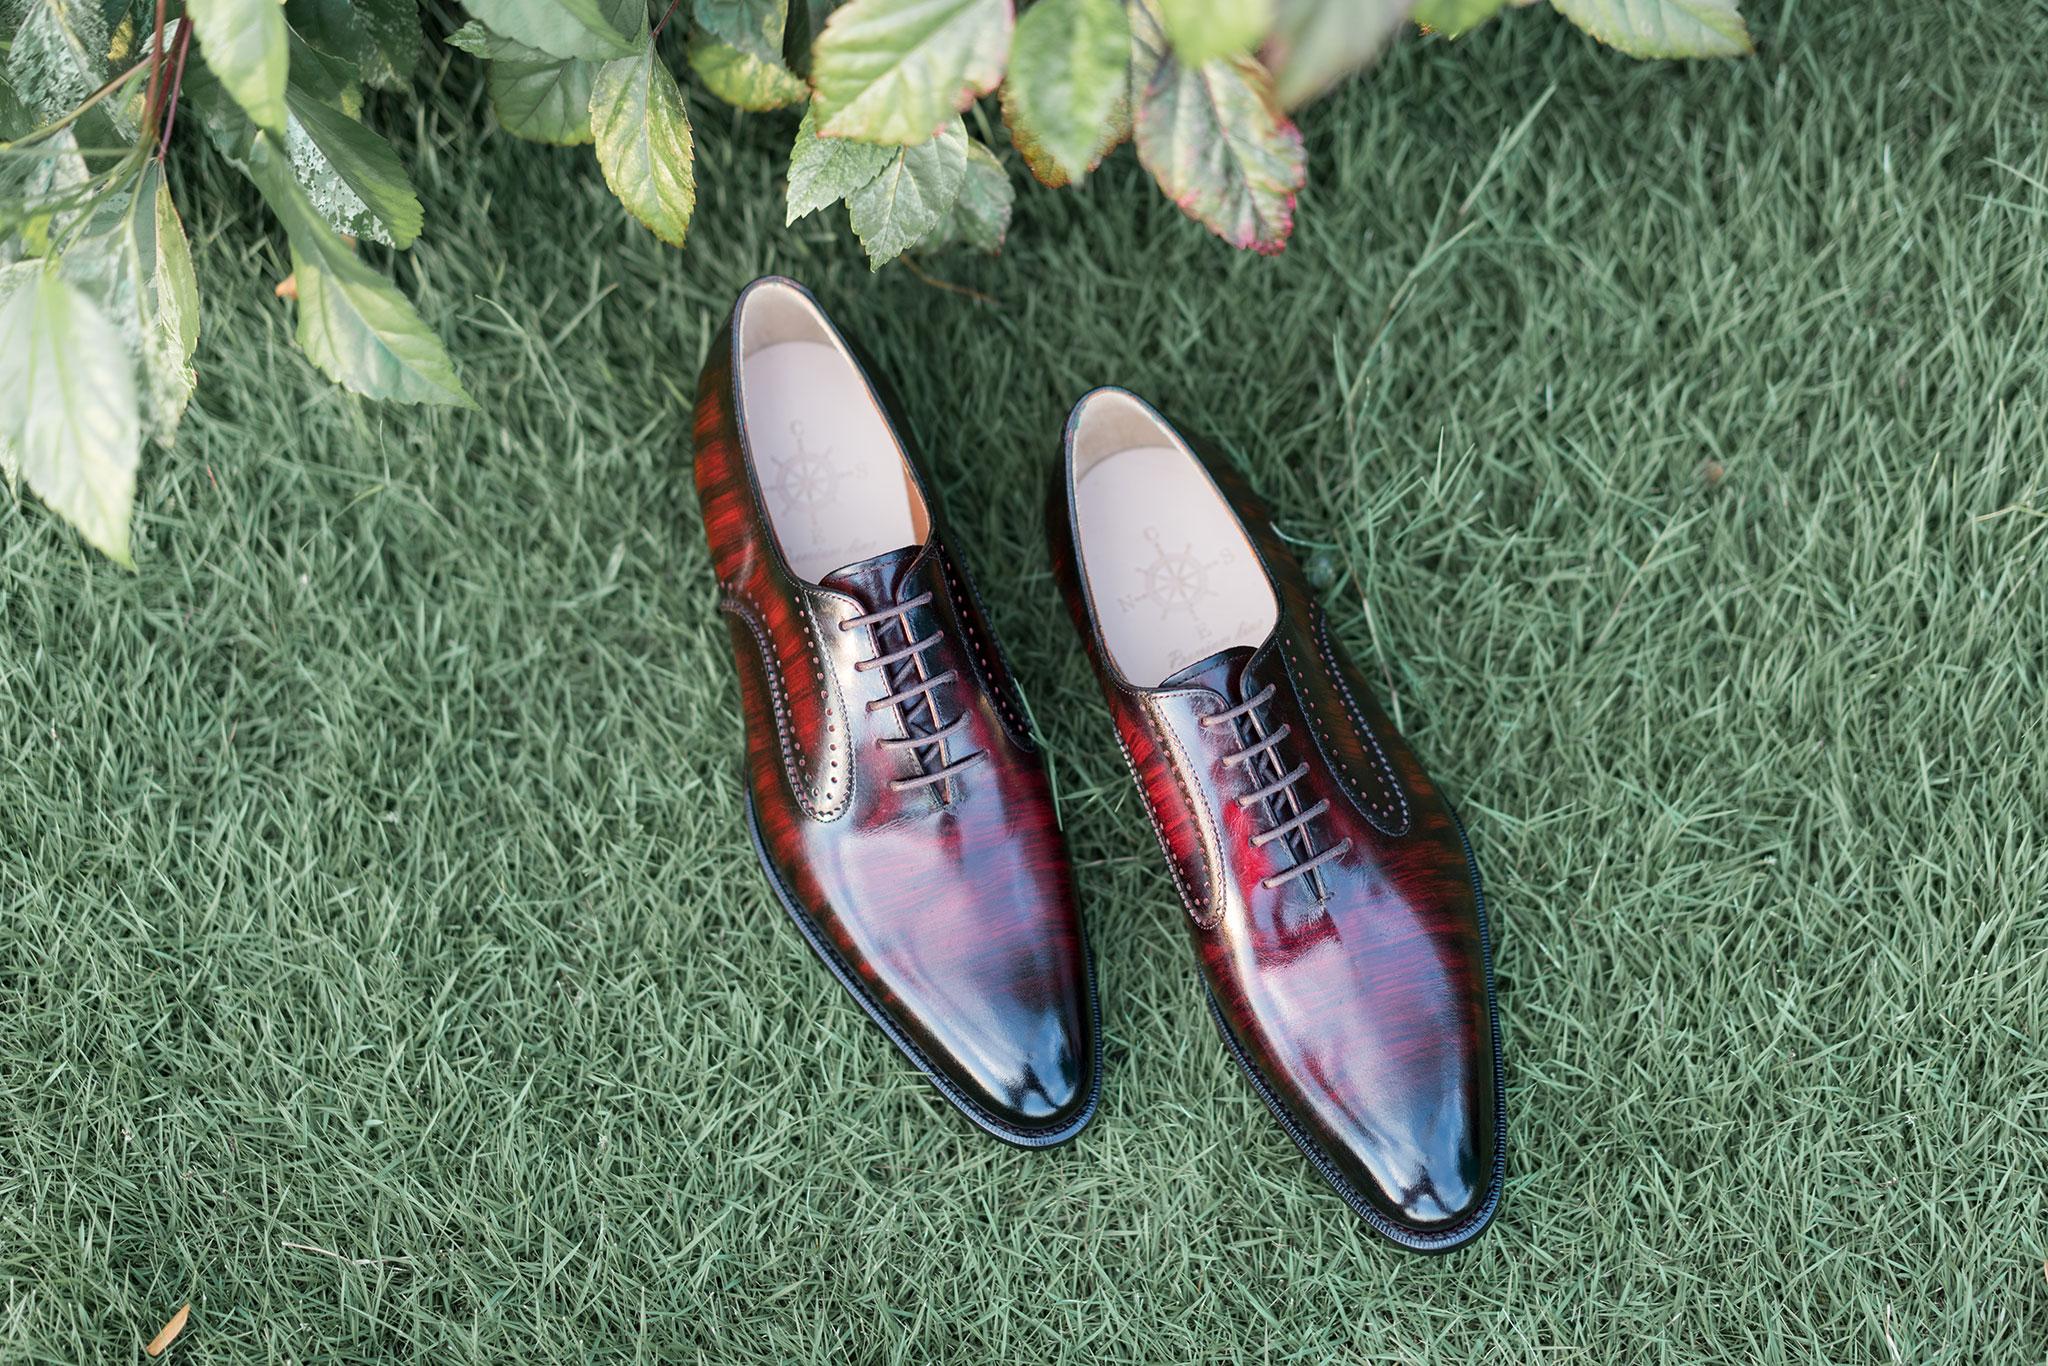 Mẫu giày tây nam paire 2